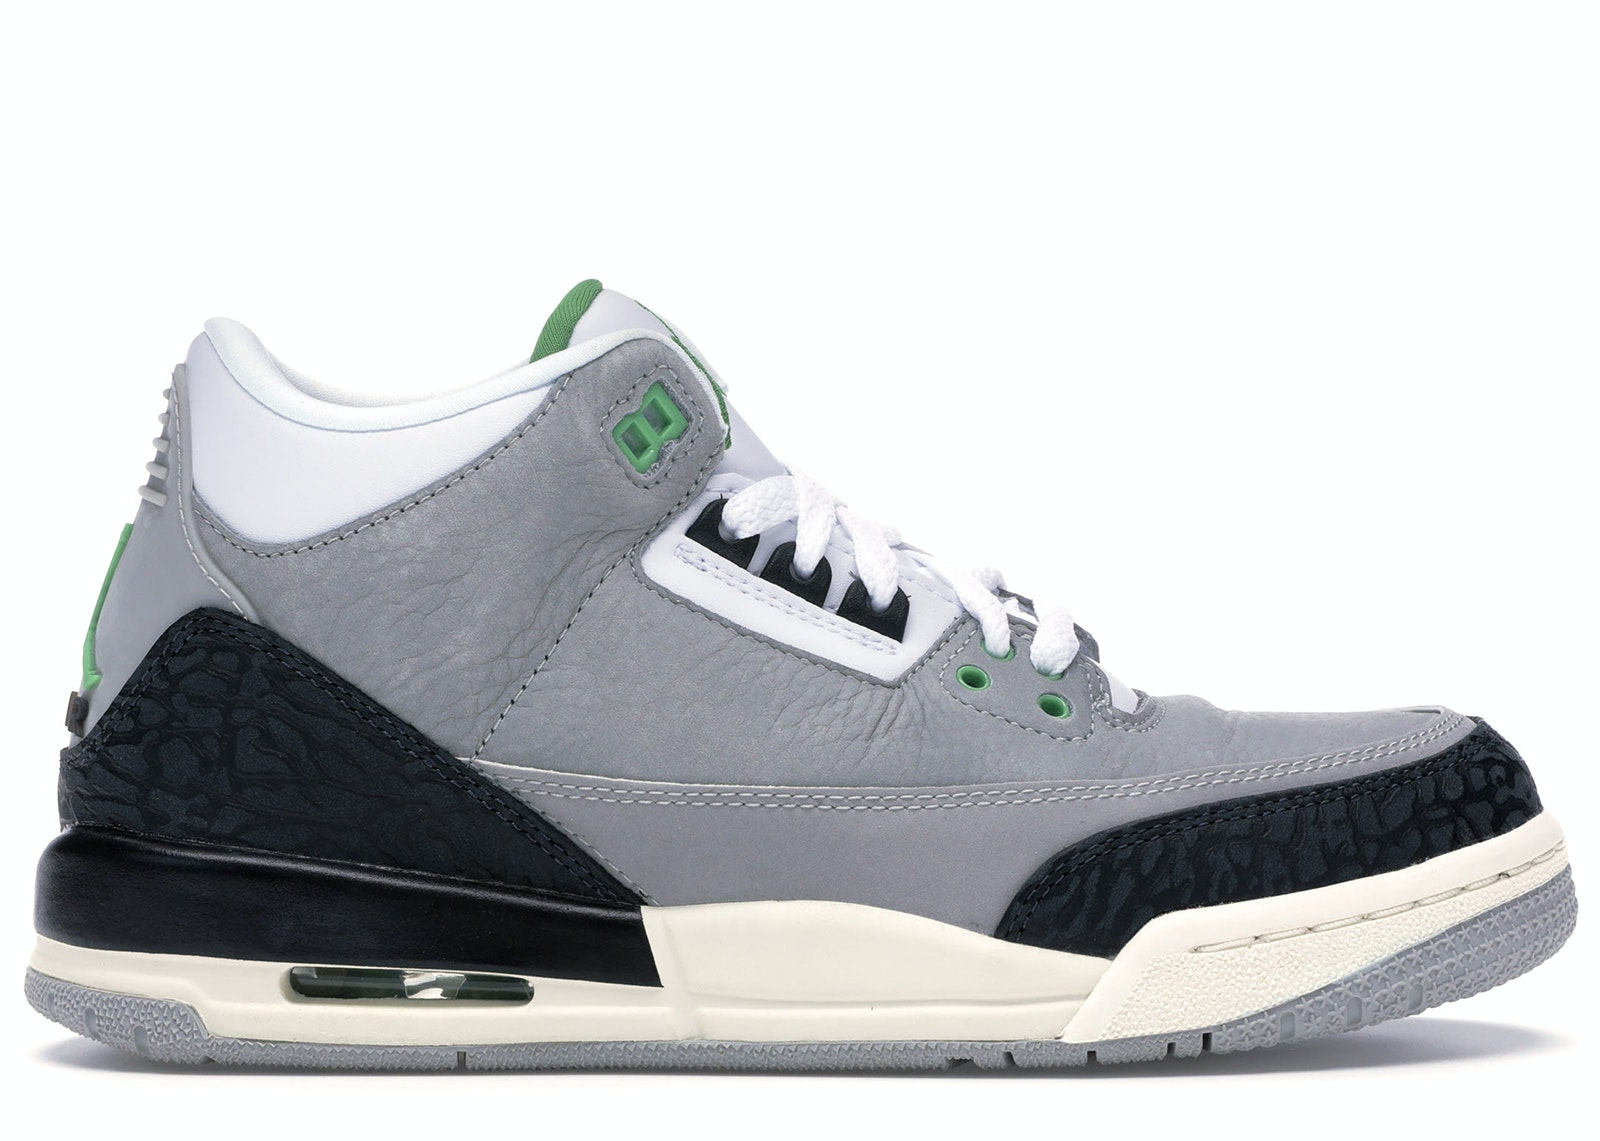 Jordan 3 Retro Chlorophyll (GS)